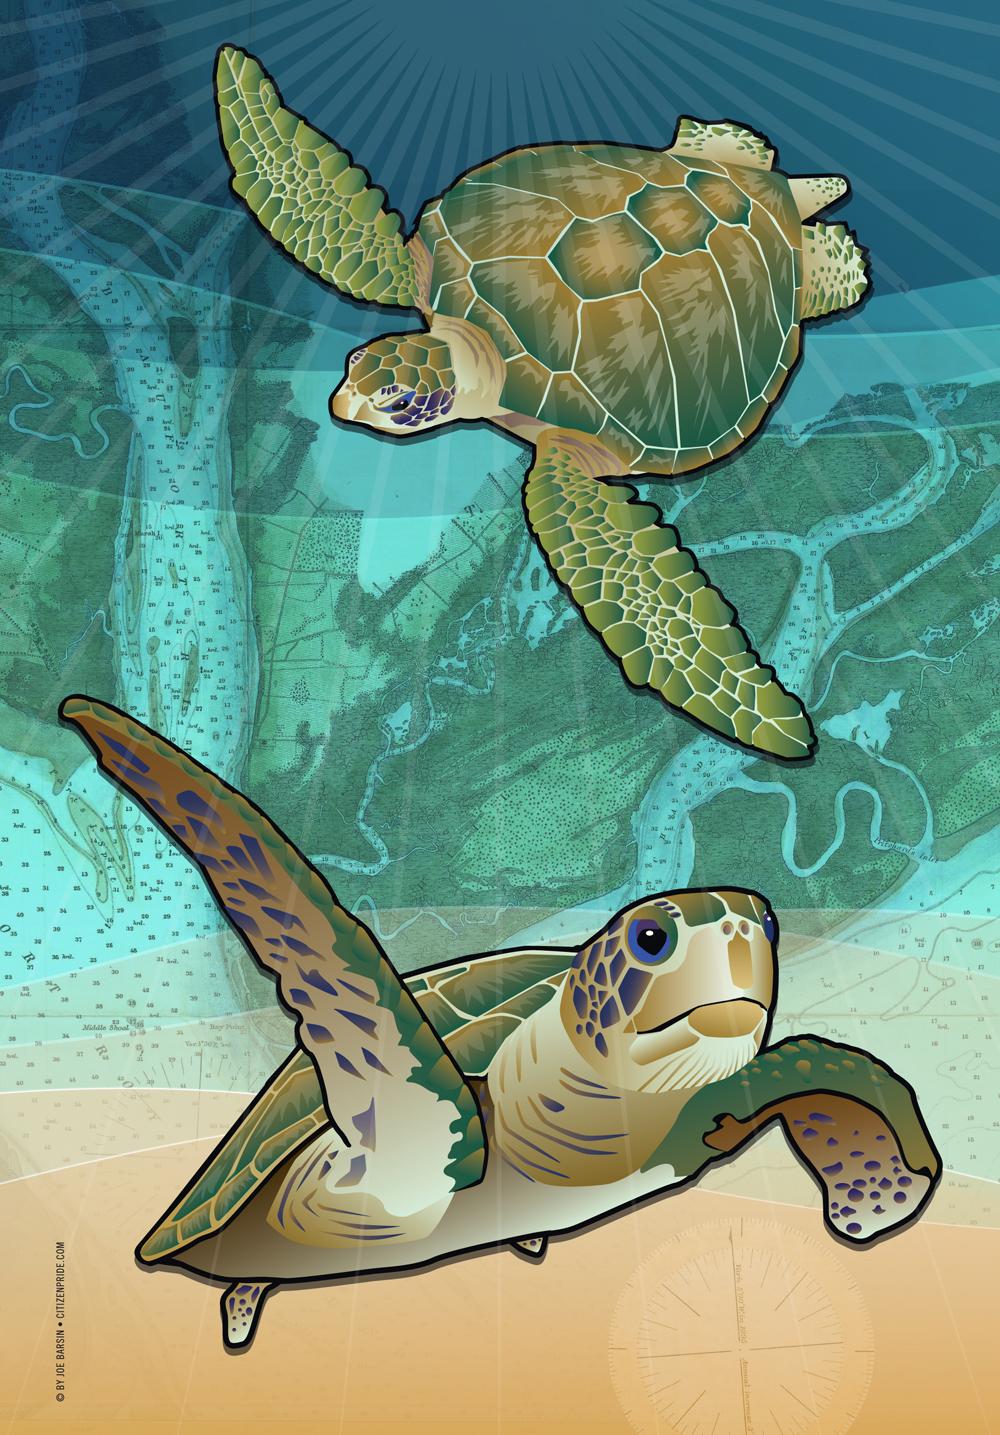 Atlantic's Sea Turtles